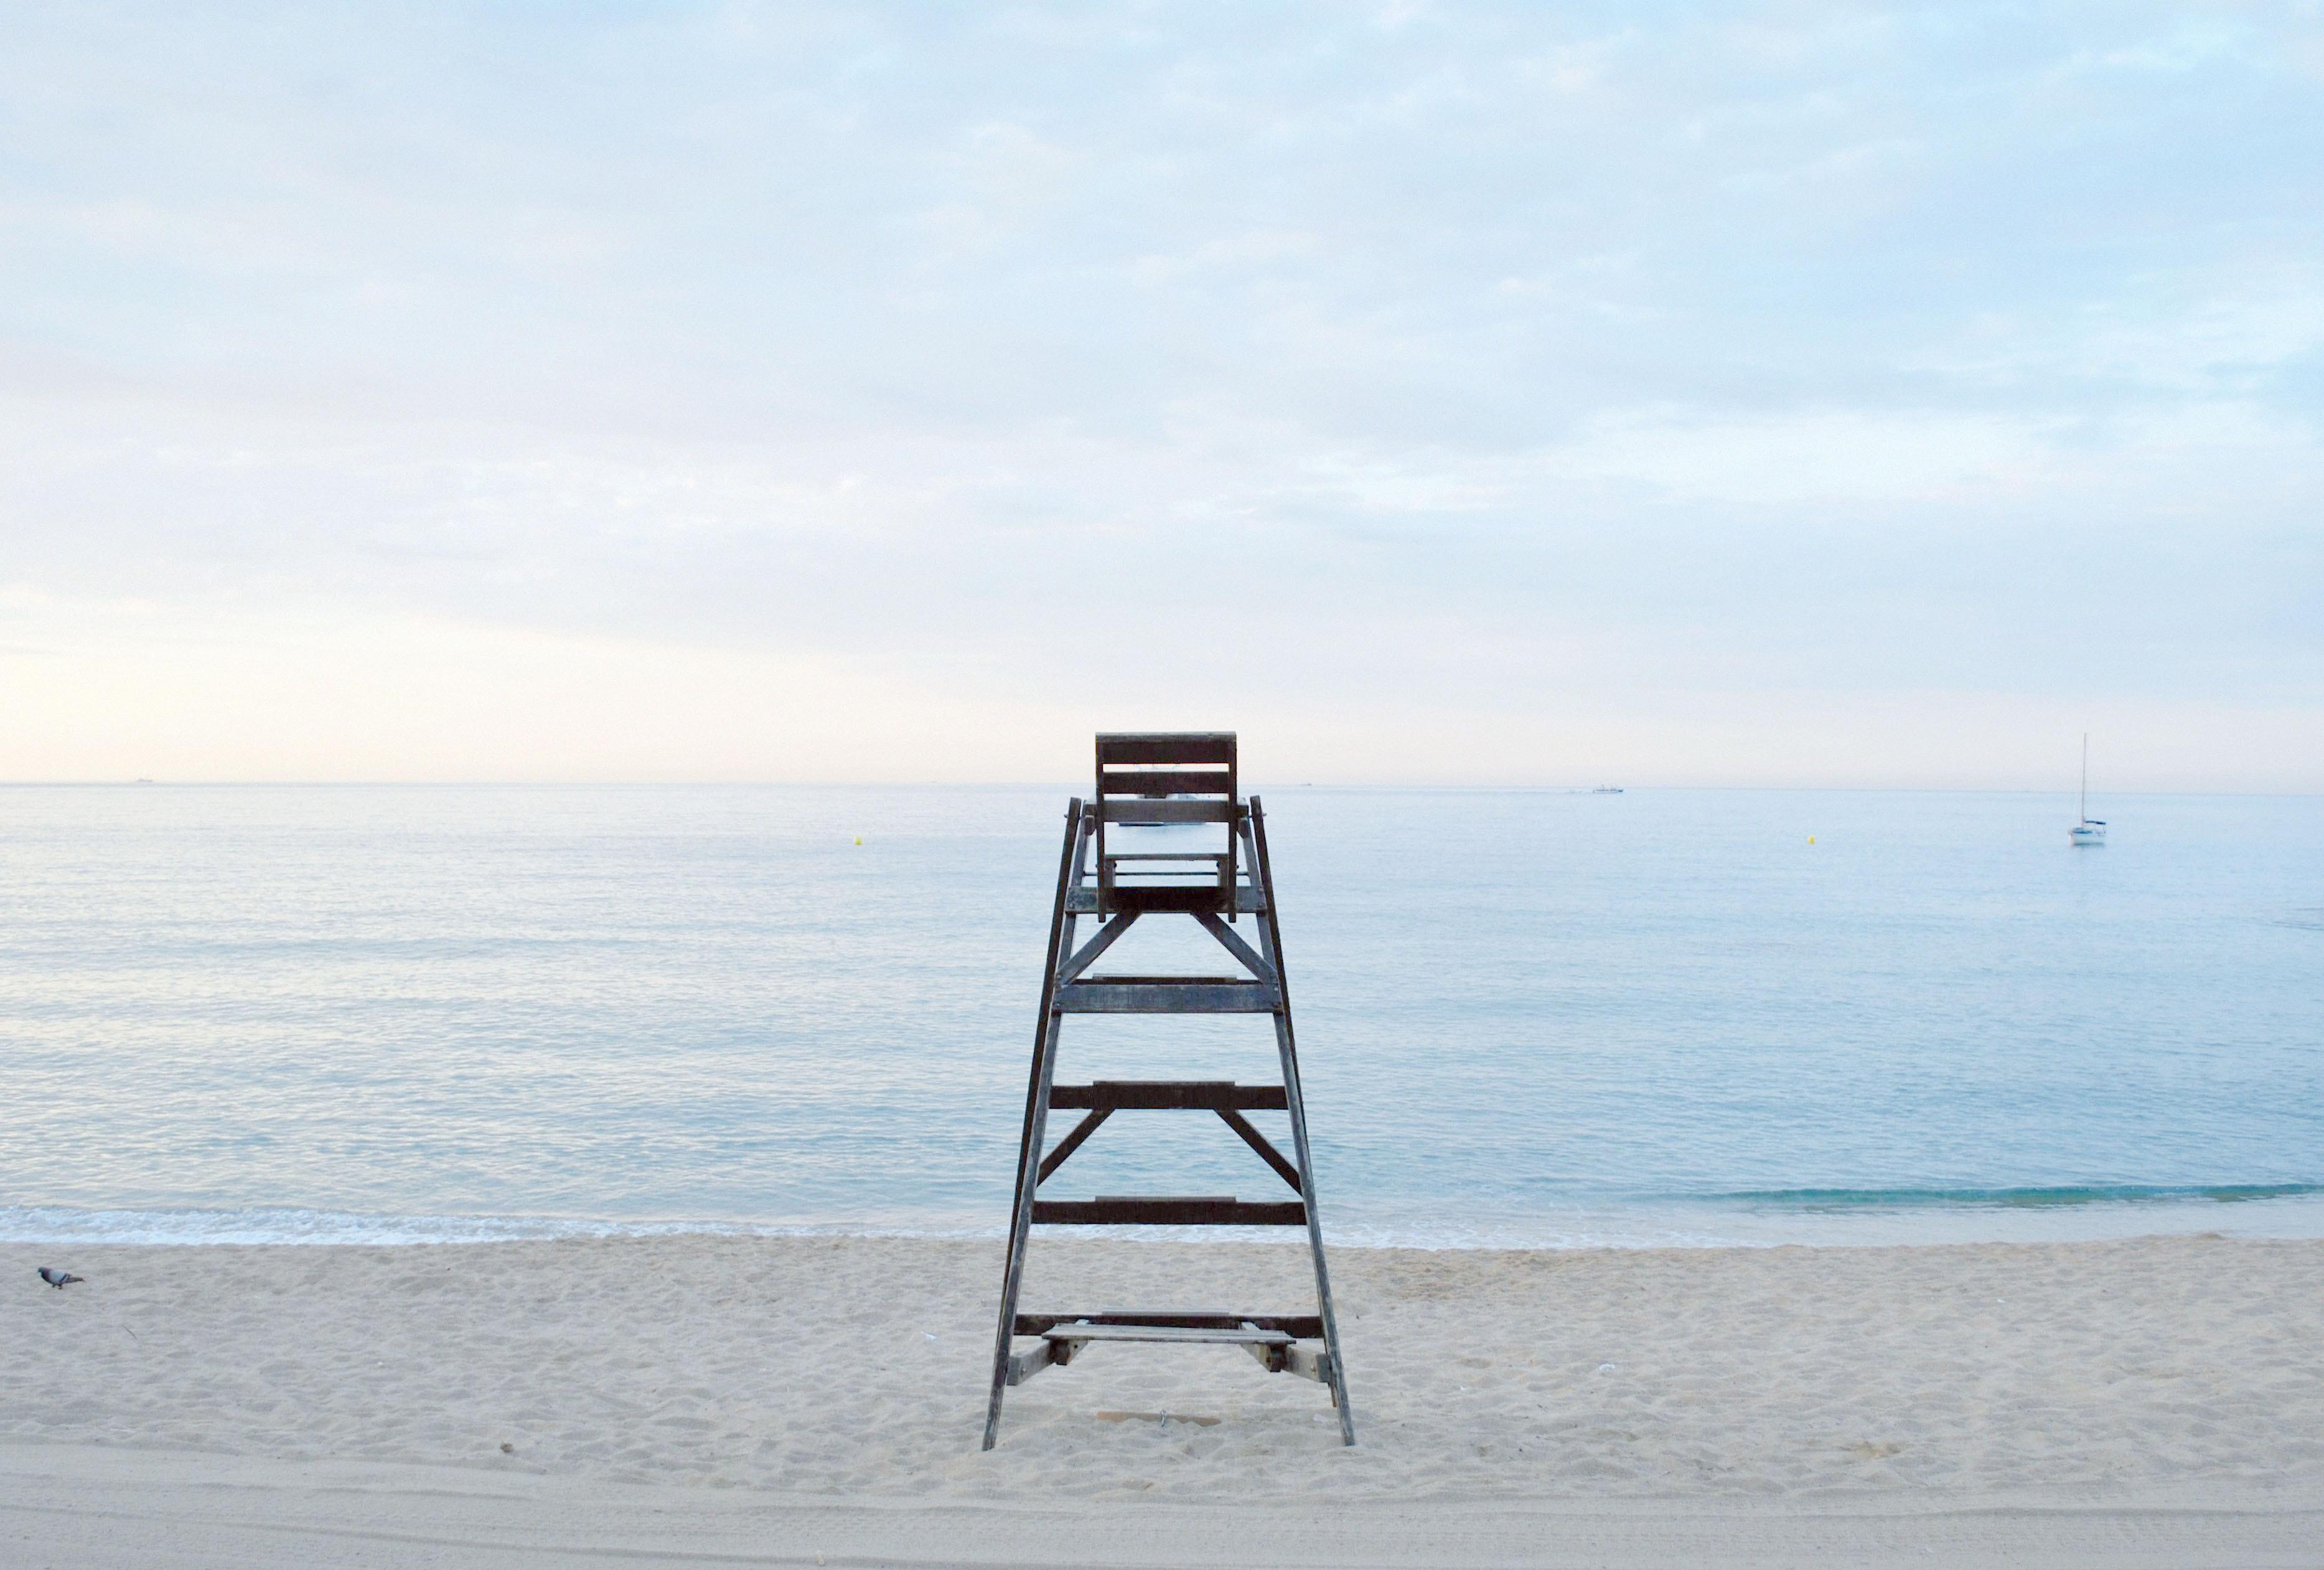 Grey Metal Step Ladder Near Beach during Daytime · Free Stock Photo